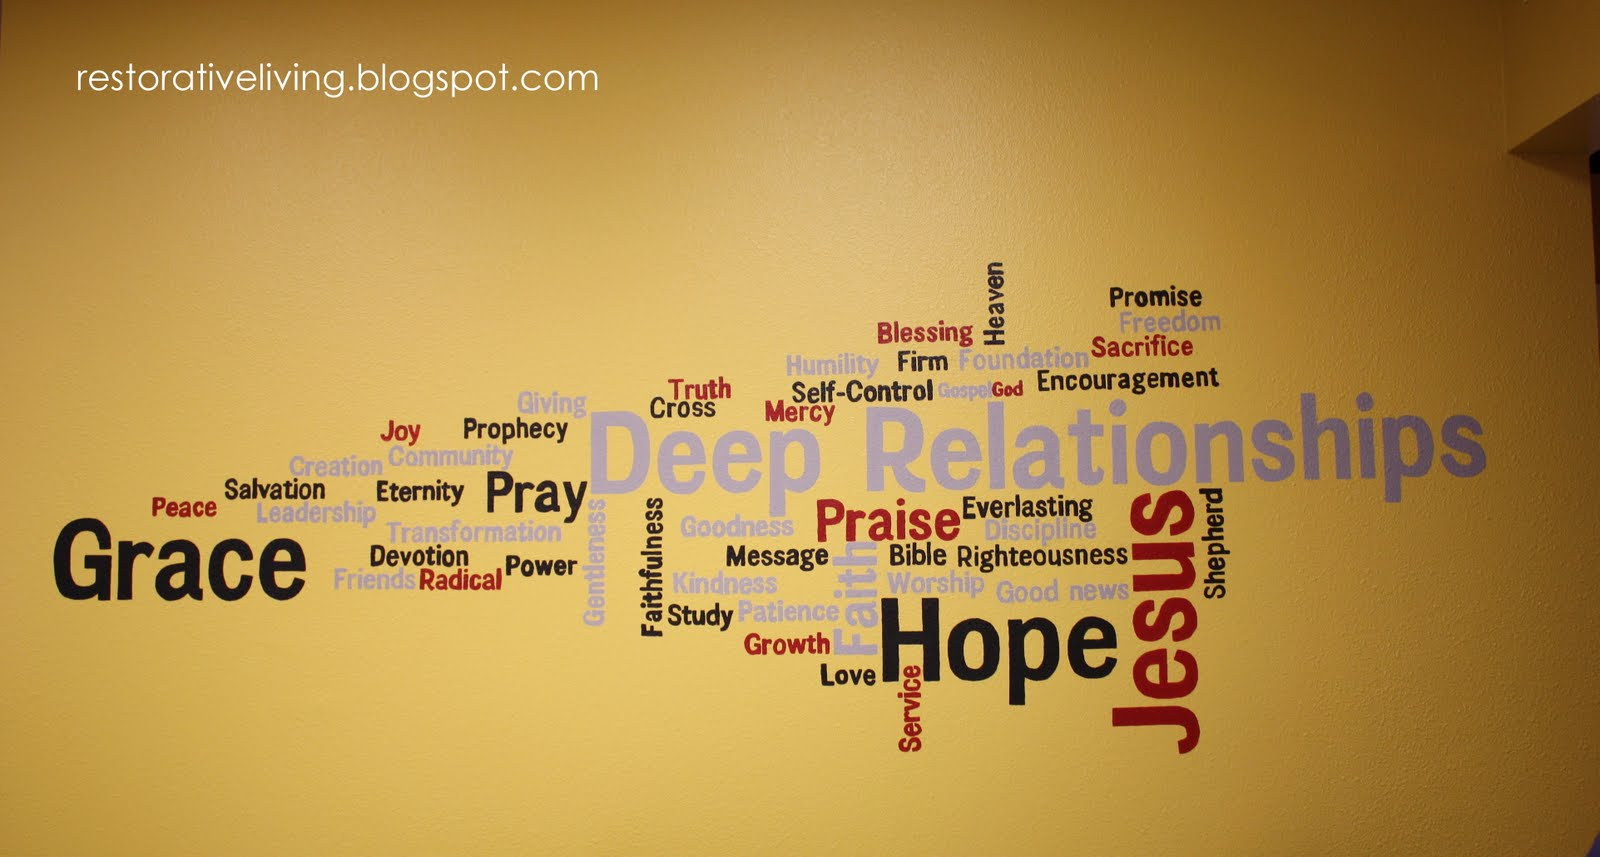 Graceful Living | Restorative Living